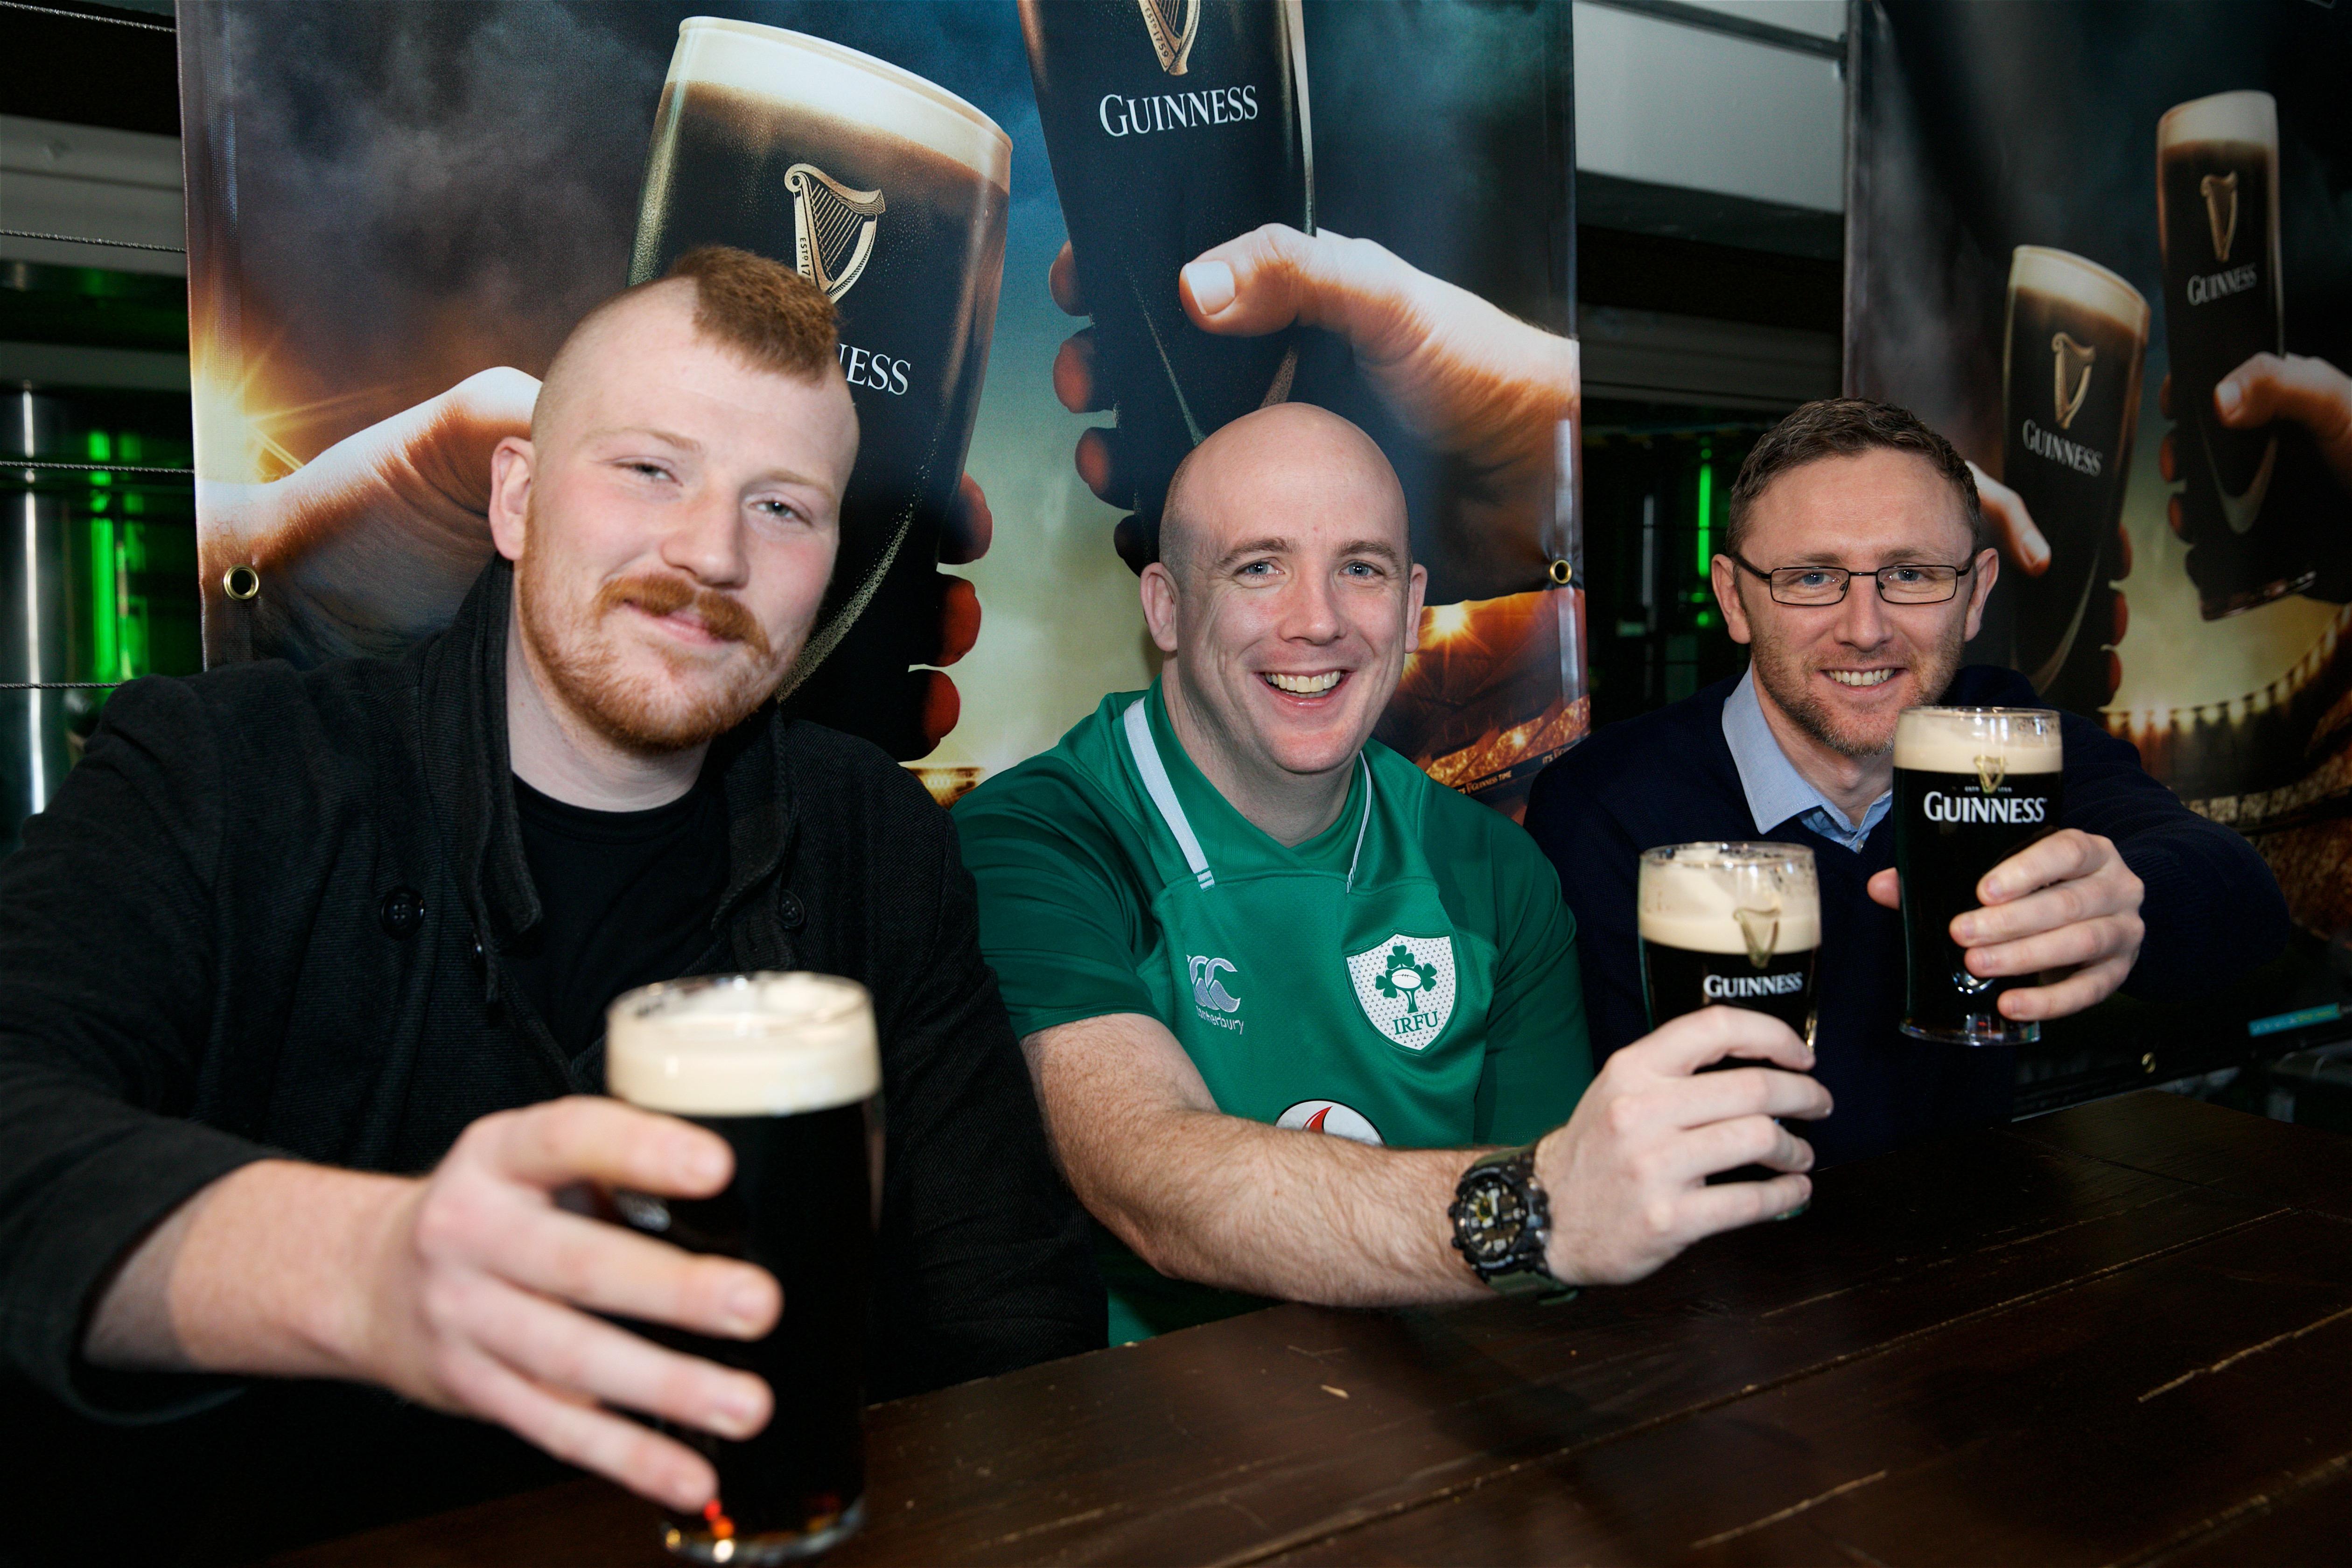 Guinness Storehouse 6 Nations Fans